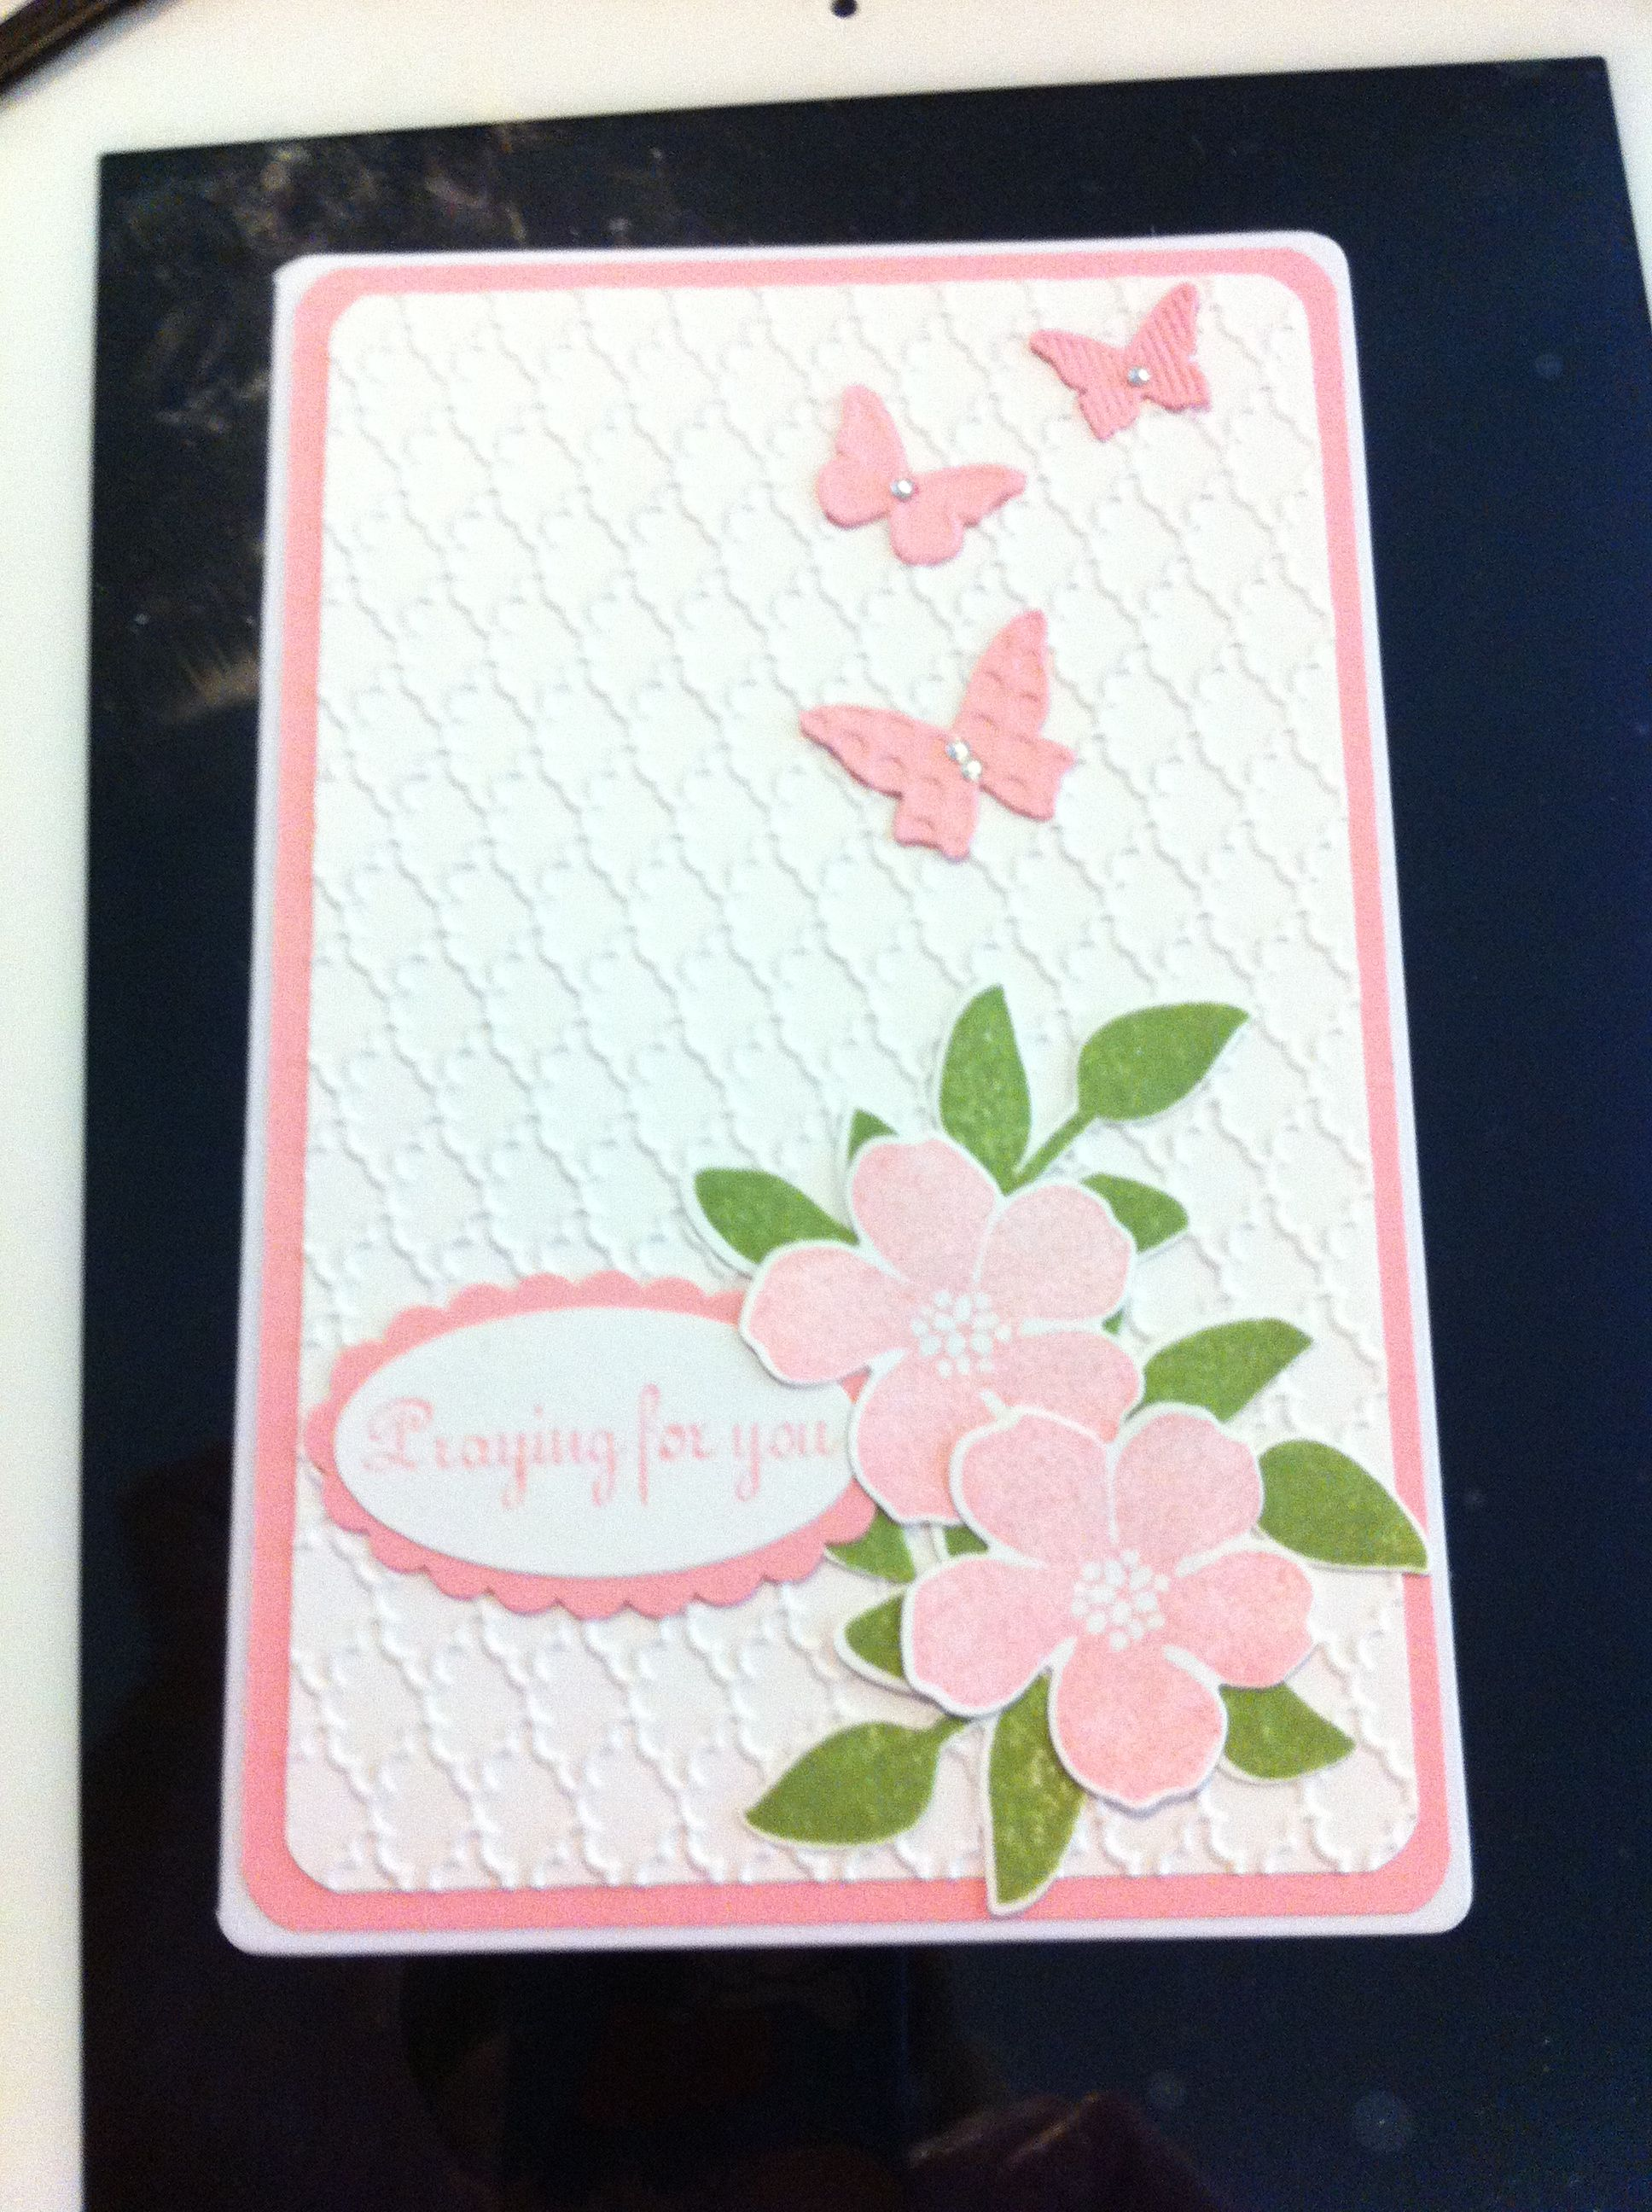 Stampin up secret garden stamp set and framelits in pretty in pink